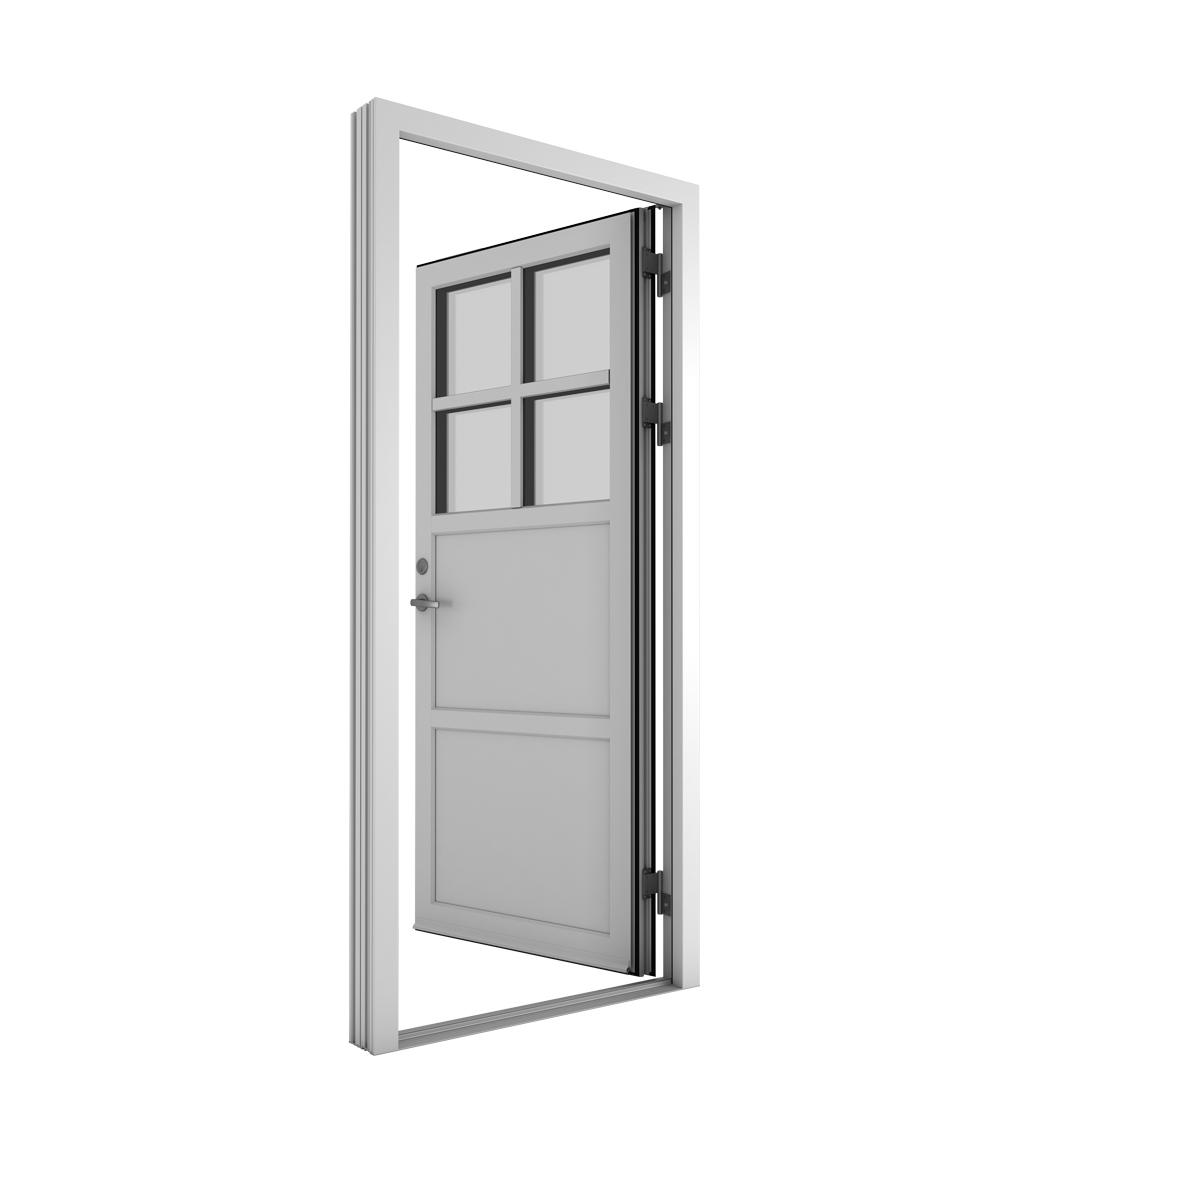 Idealcombi nation ic inward opening entrance door for Inward opening french doors